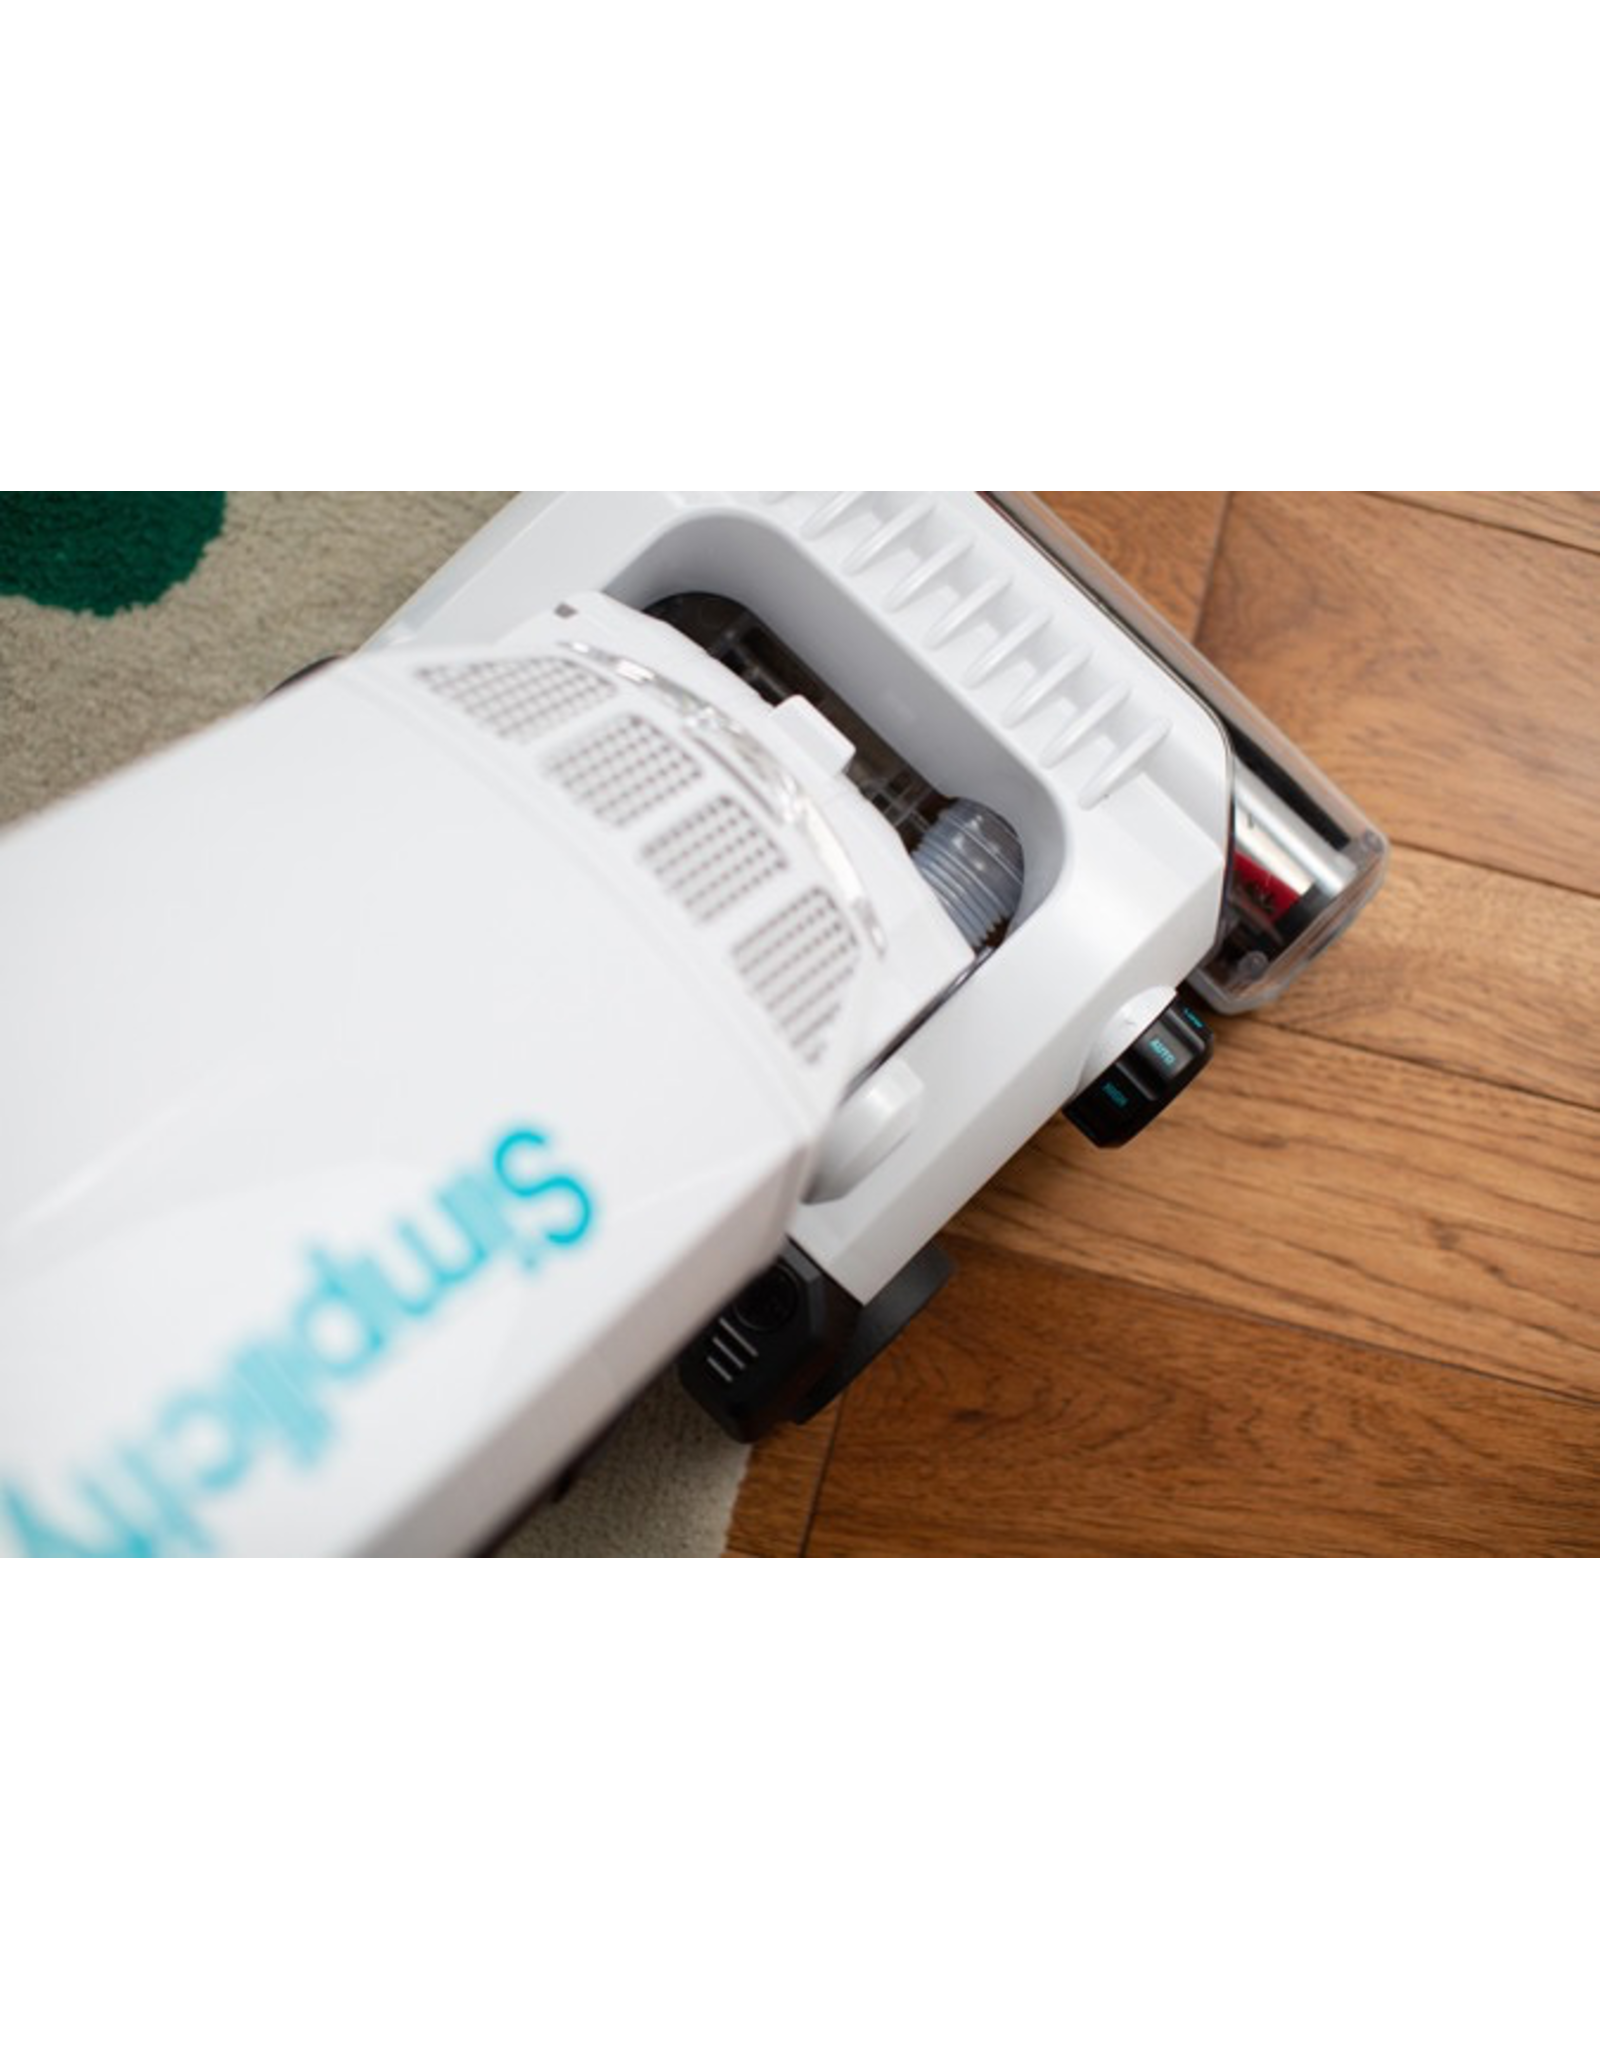 Simplicity Simplicity S20EZM Allergy Upright Vacuum